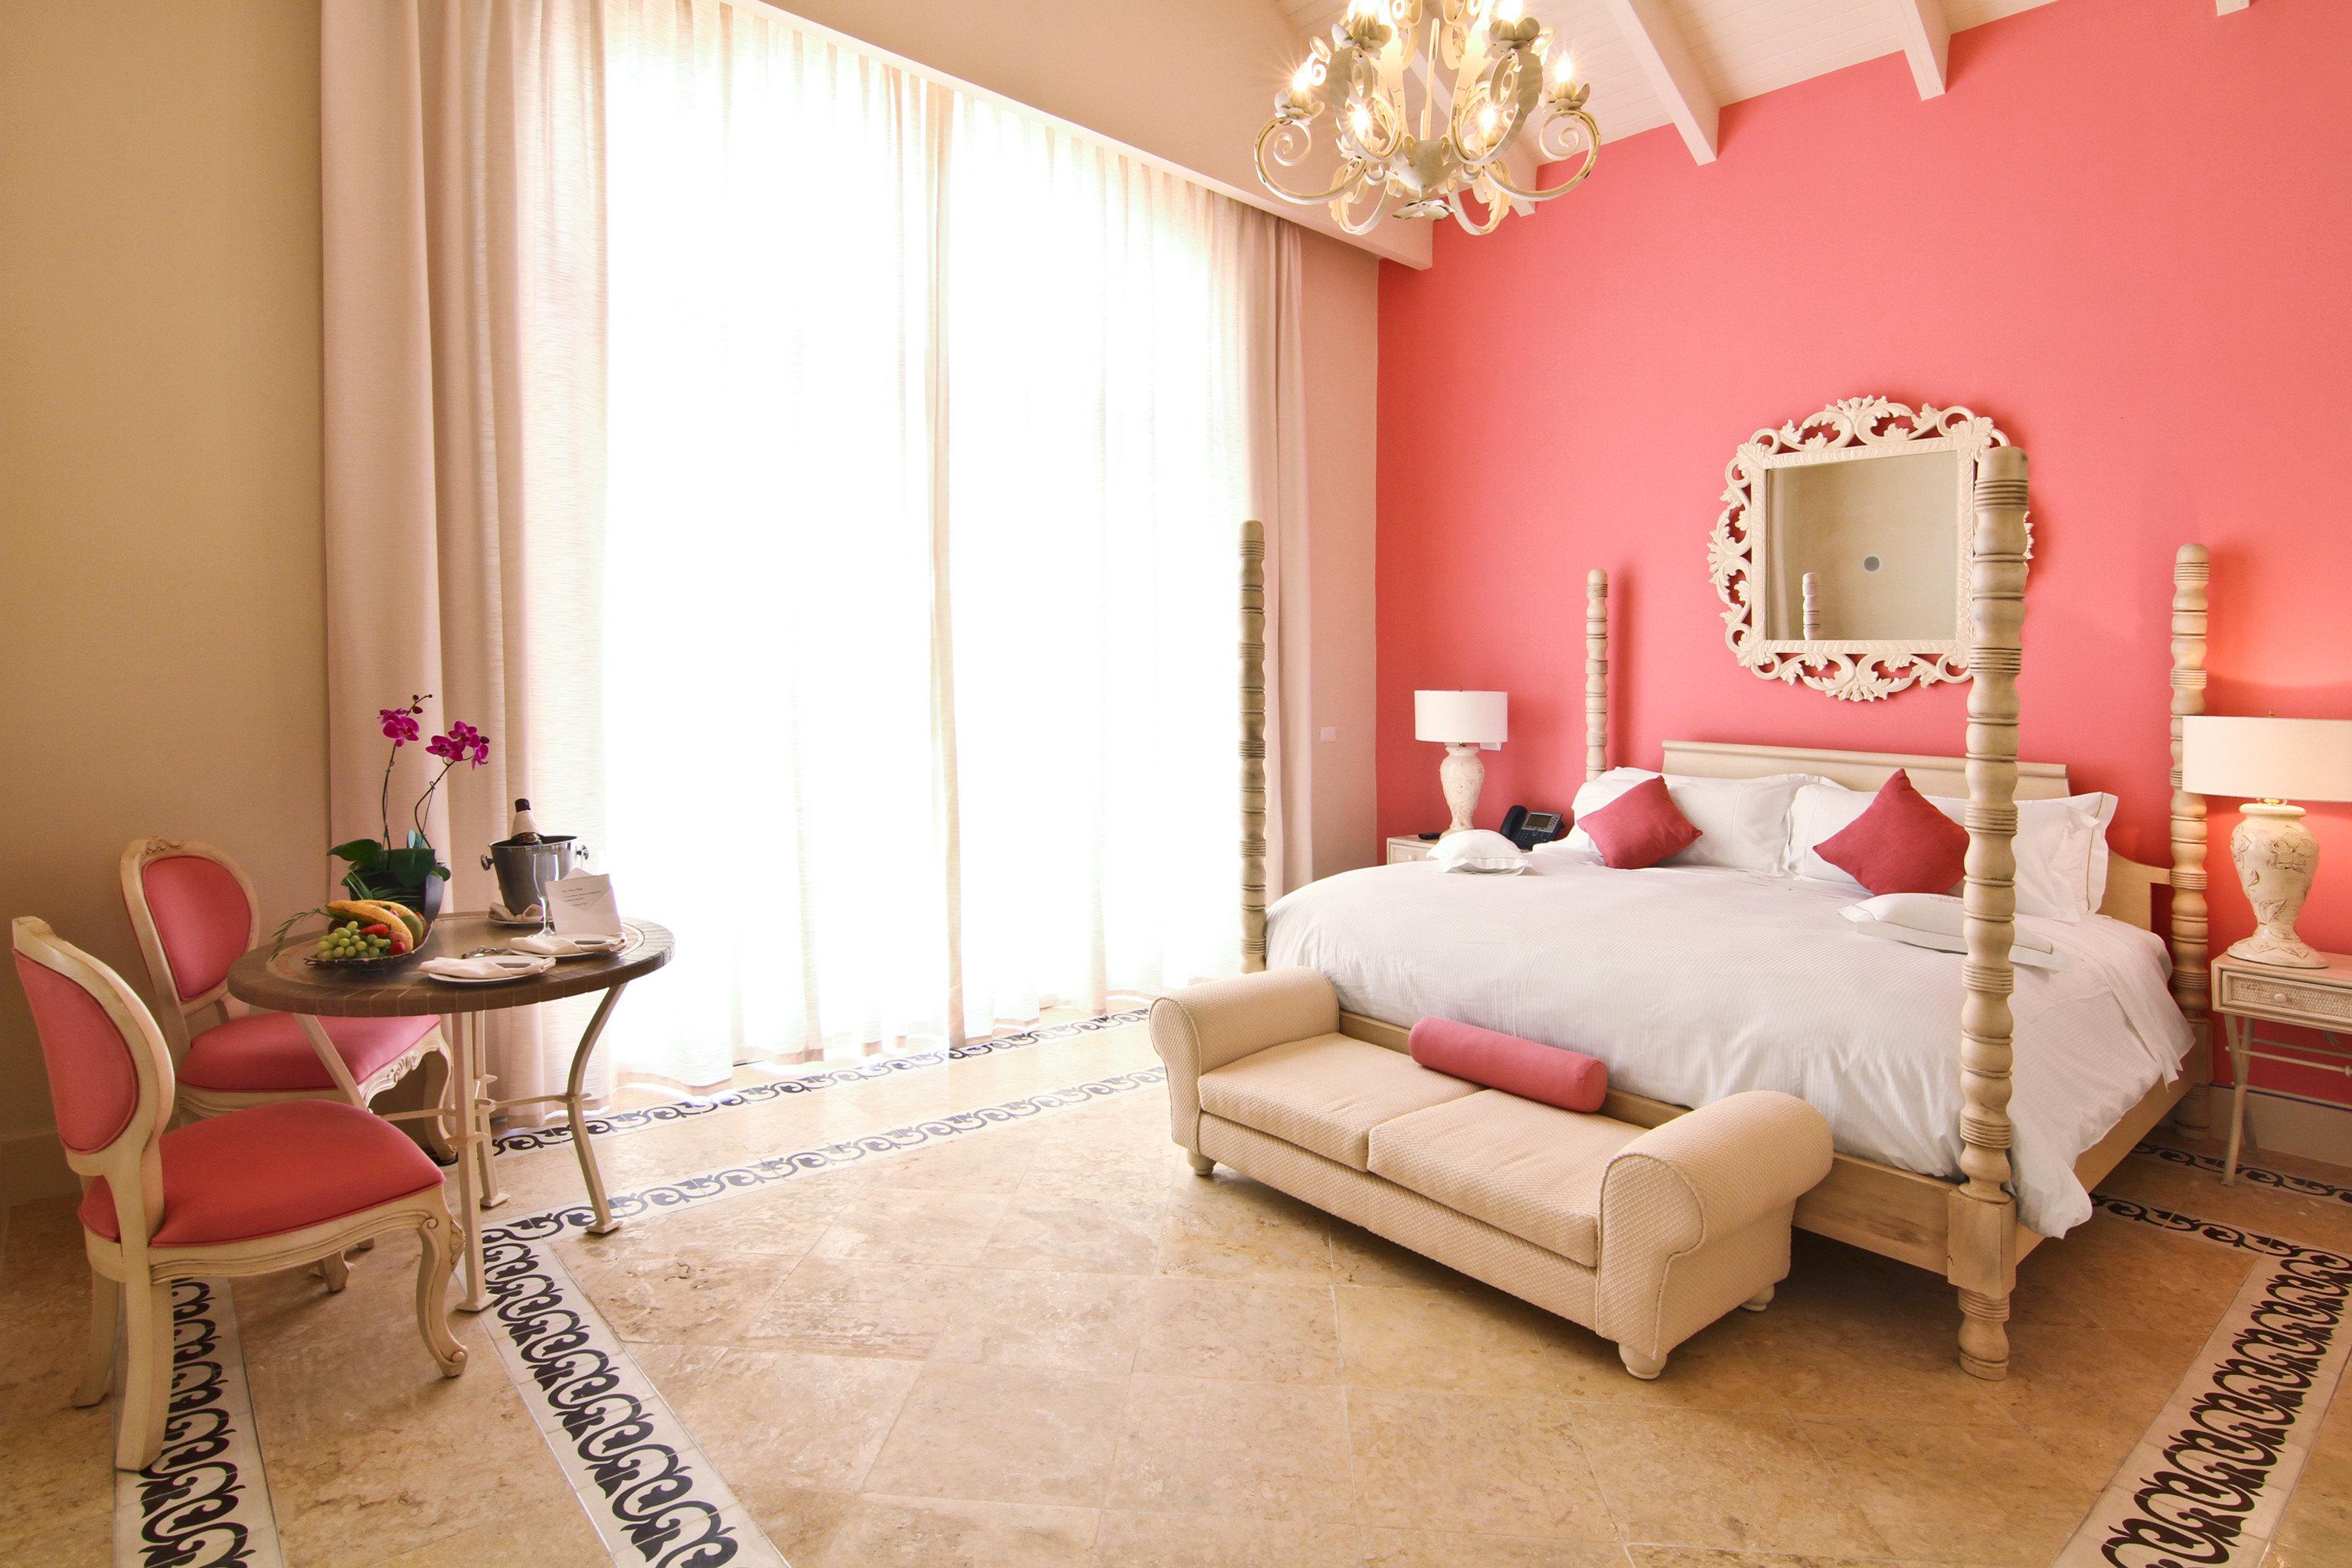 Hotels floor indoor wall room property living room Bedroom interior design Suite home cottage furniture real estate estate apartment